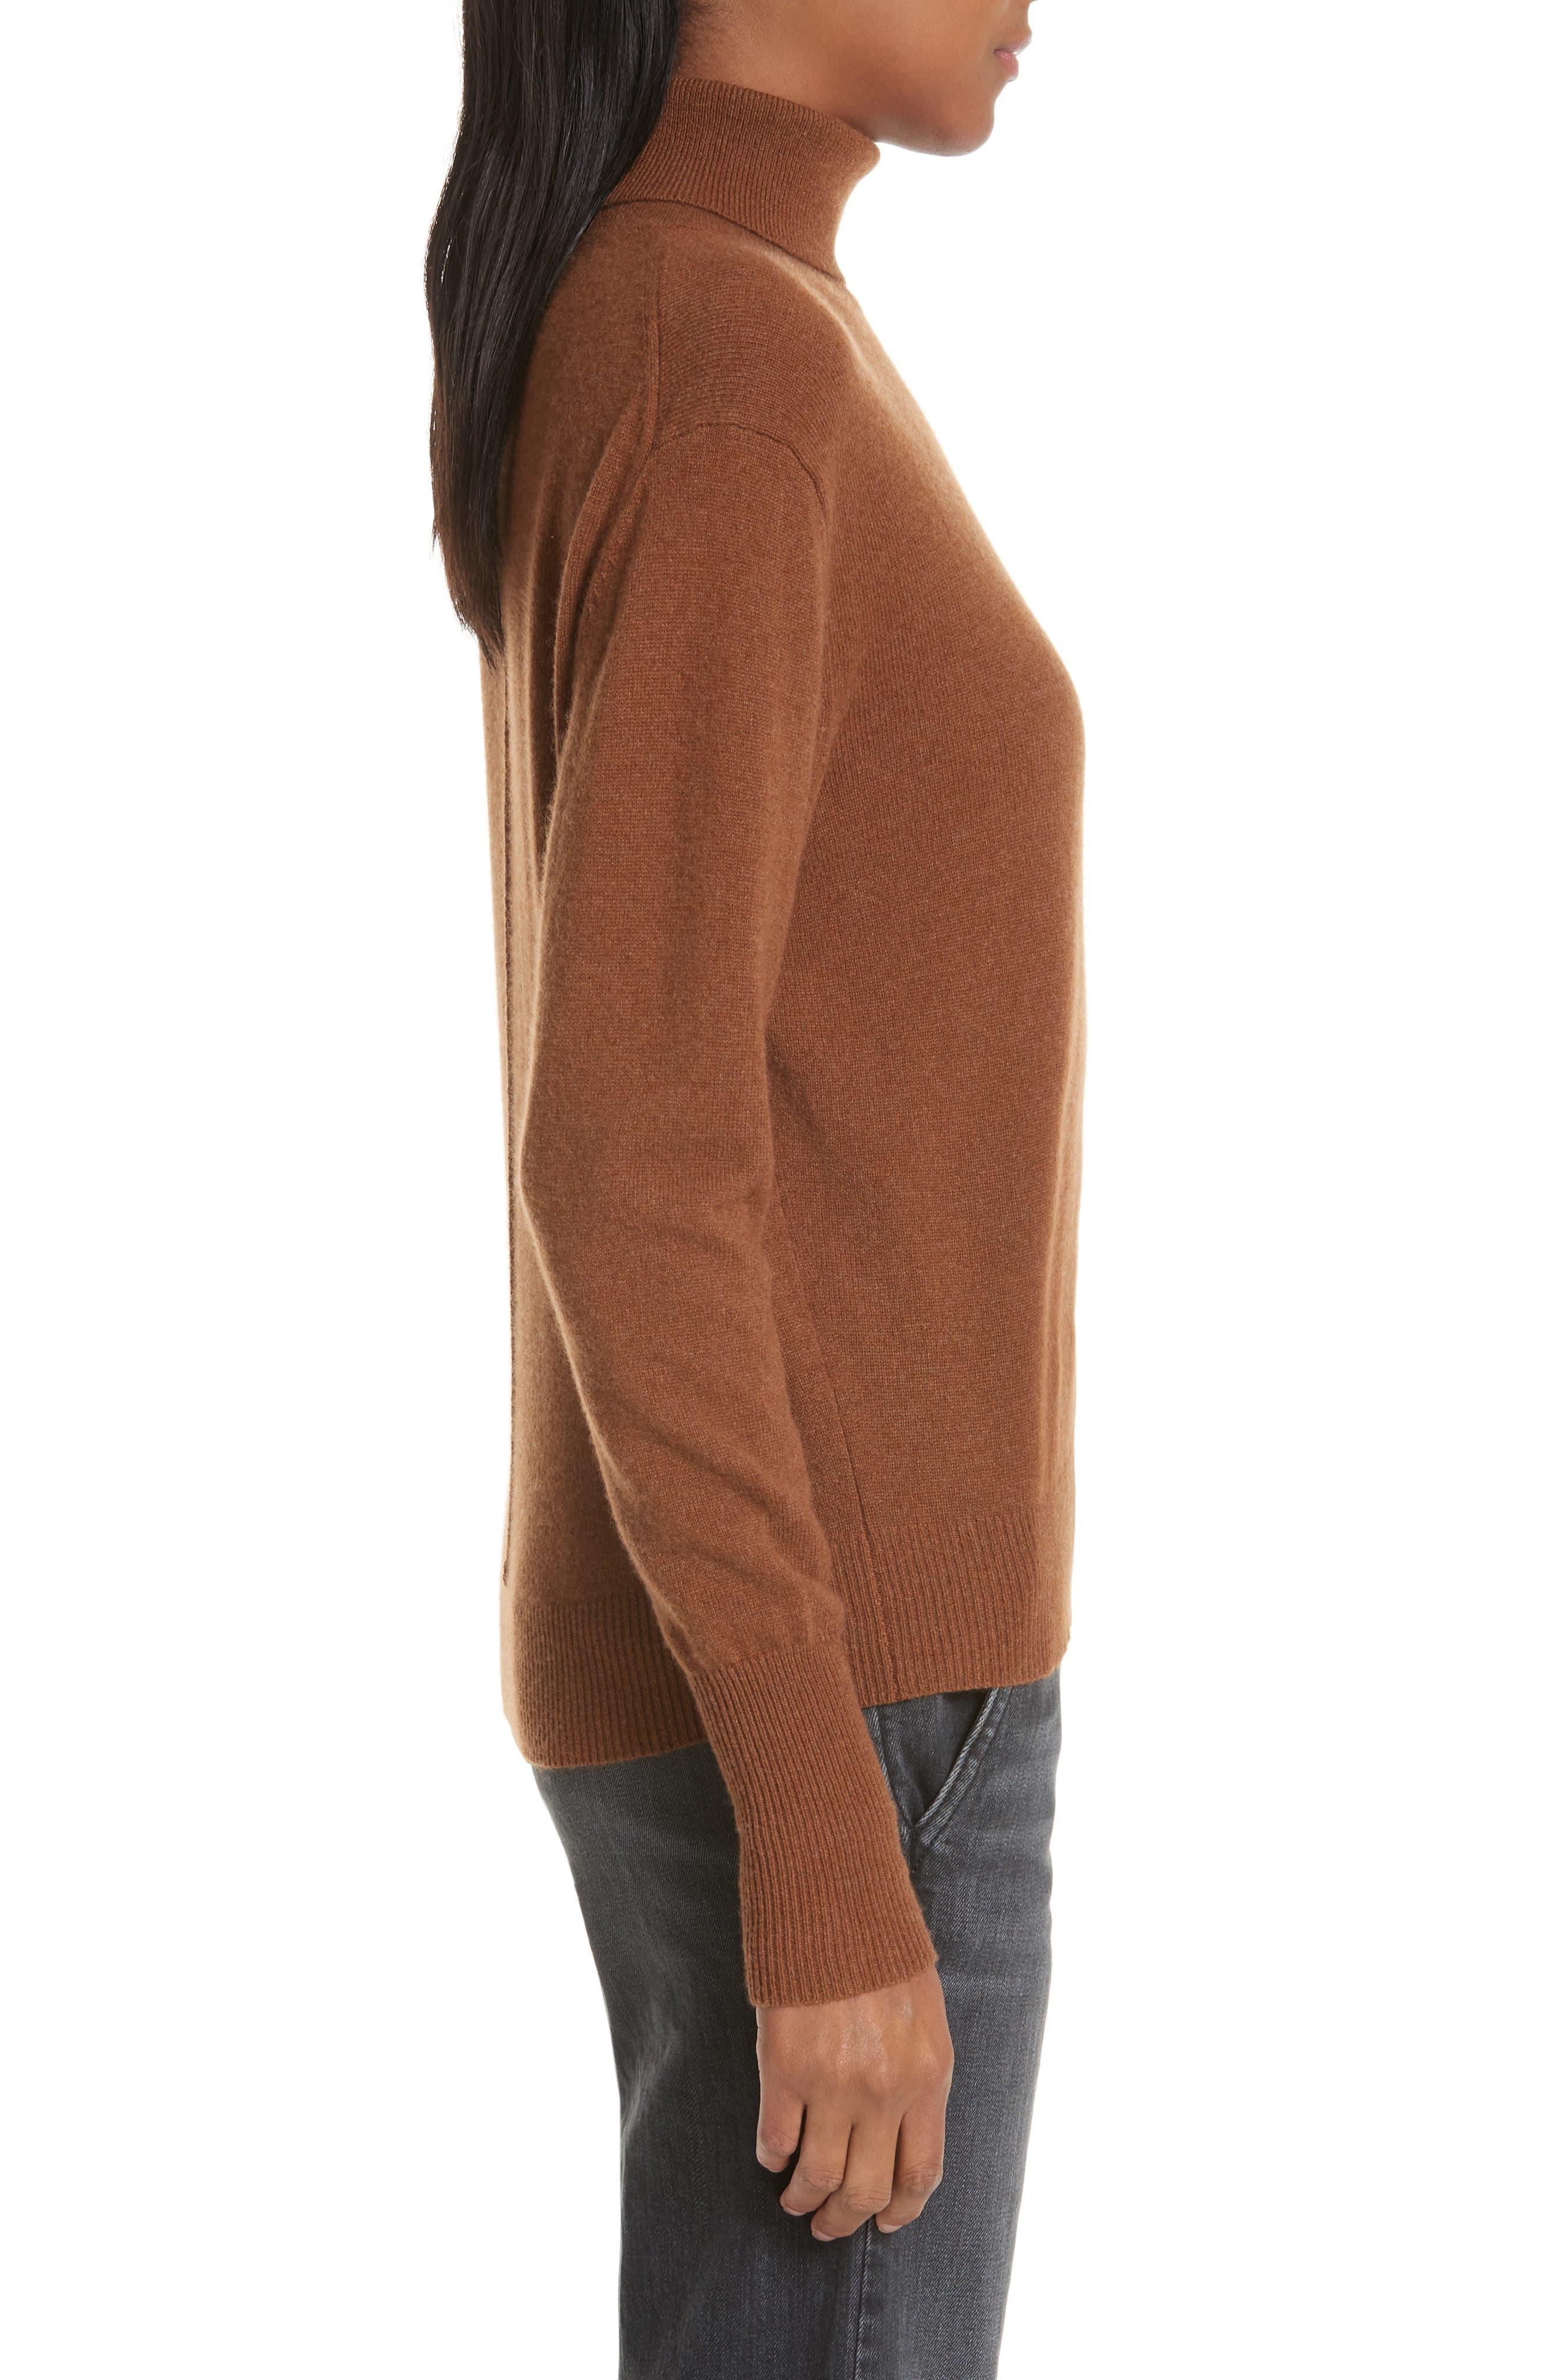 NILI LOTAN, Ralphie Cashmere Turtleneck Sweater, Alternate thumbnail 3, color, COGNAC